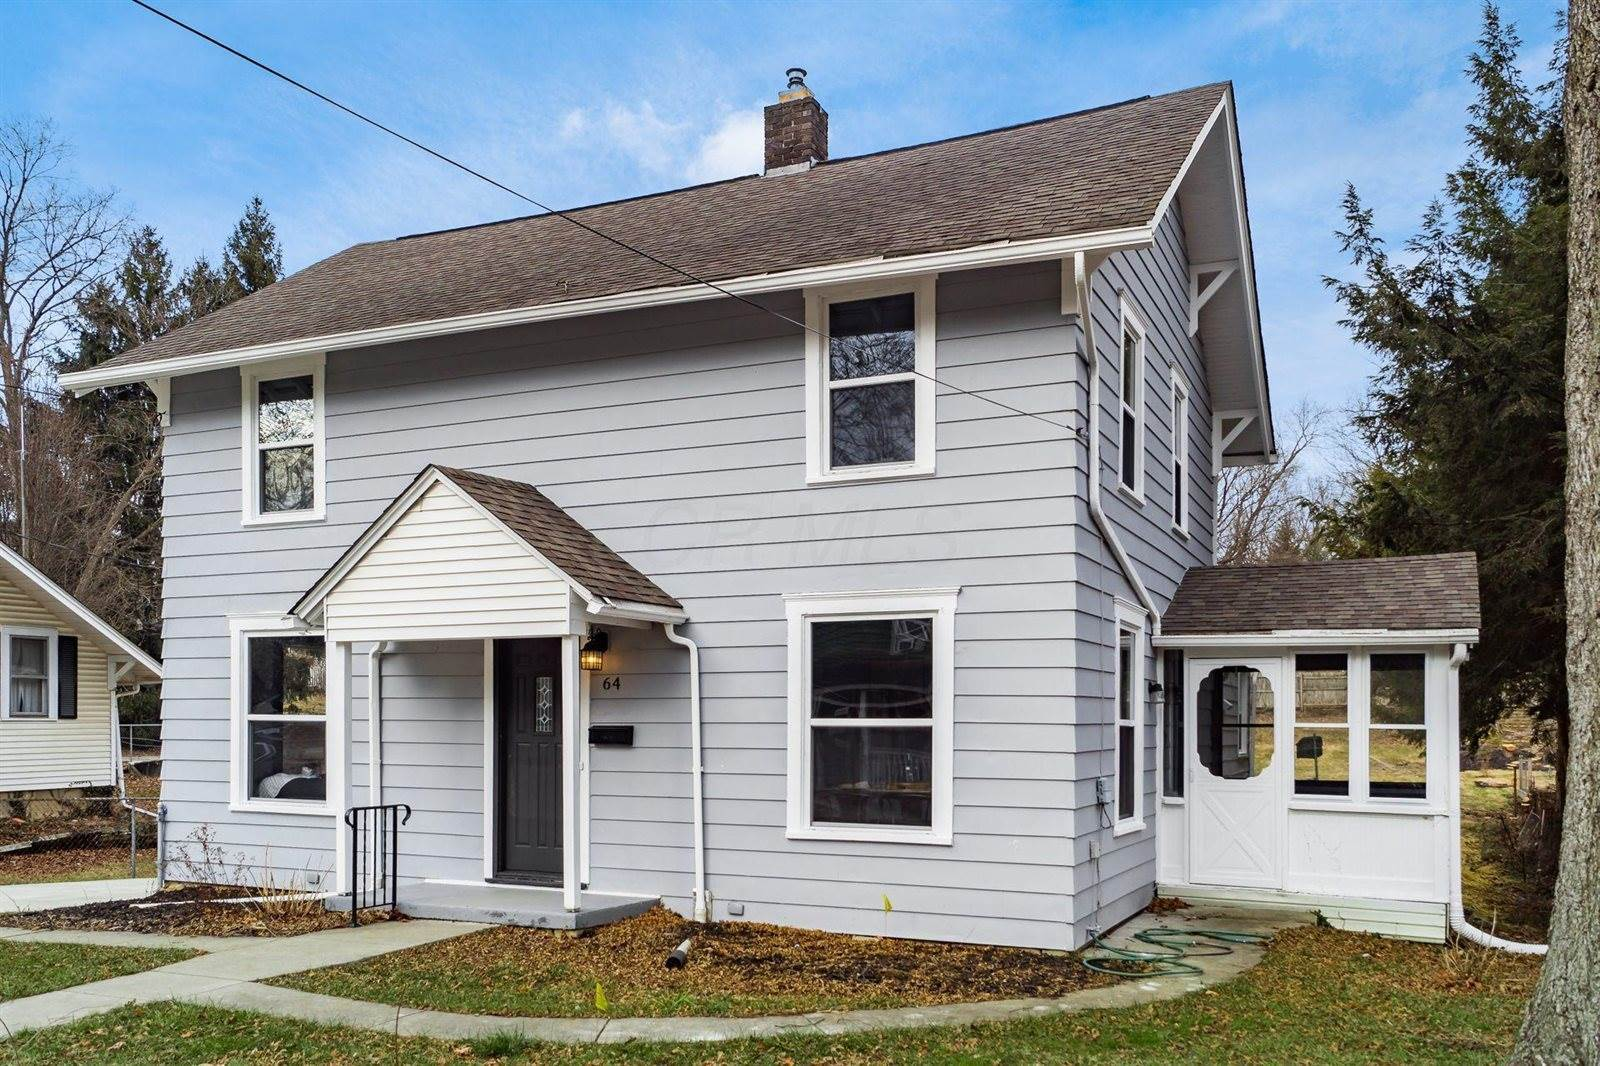 64 West Walnut Street, Westerville, OH 43081